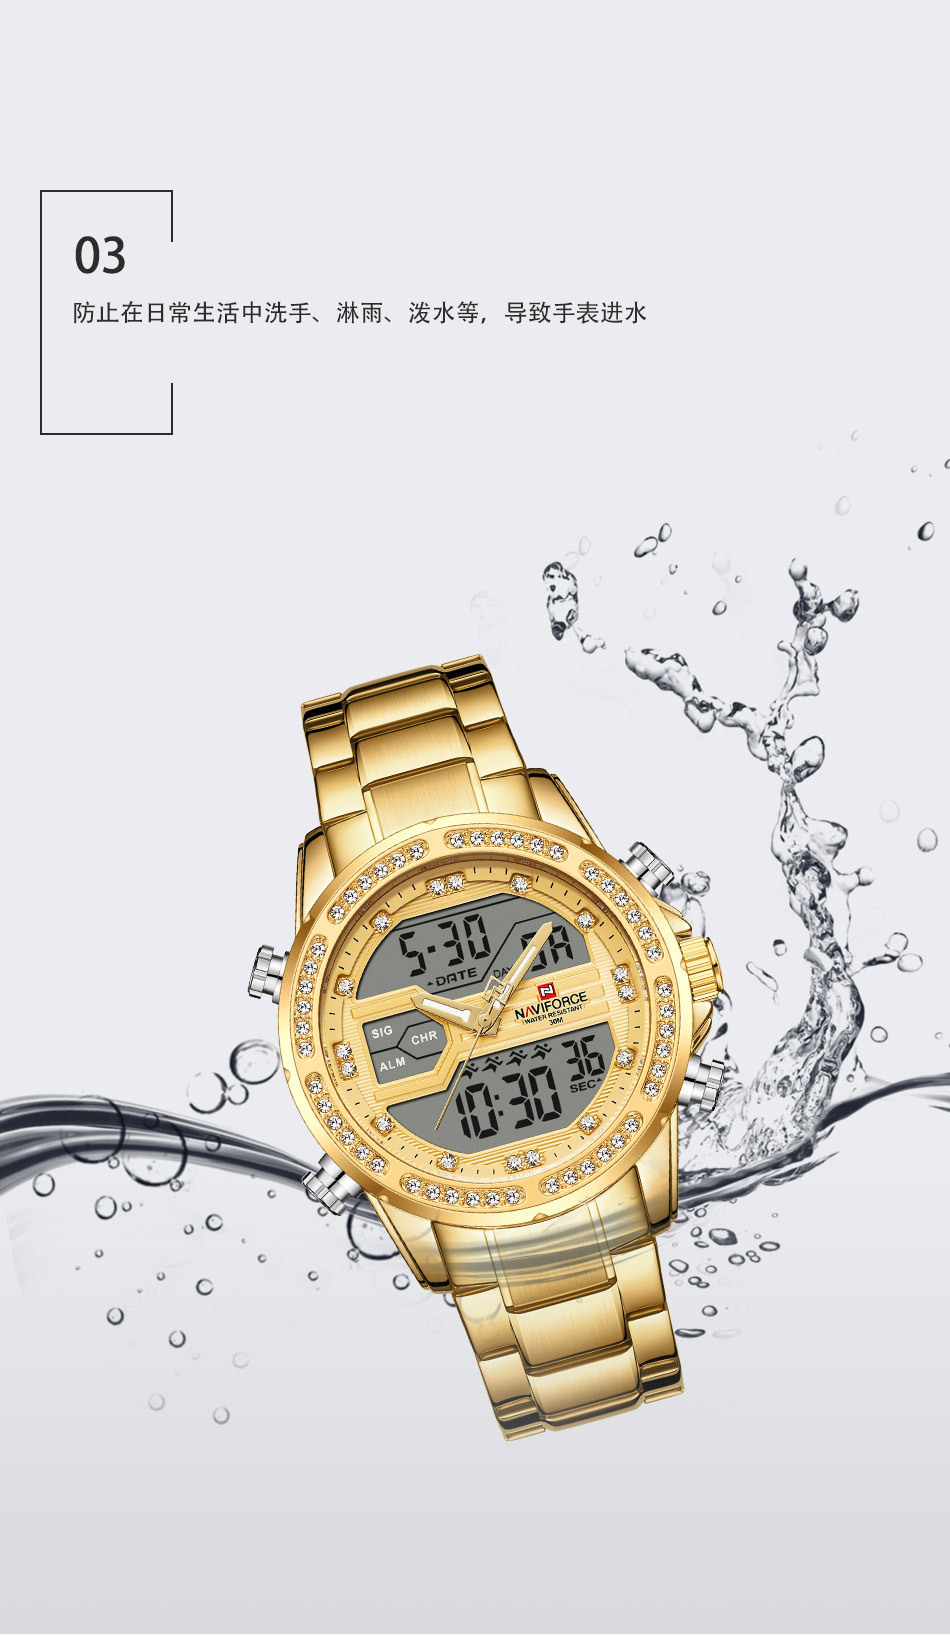 aço inoxidável relógio esportivo masculino